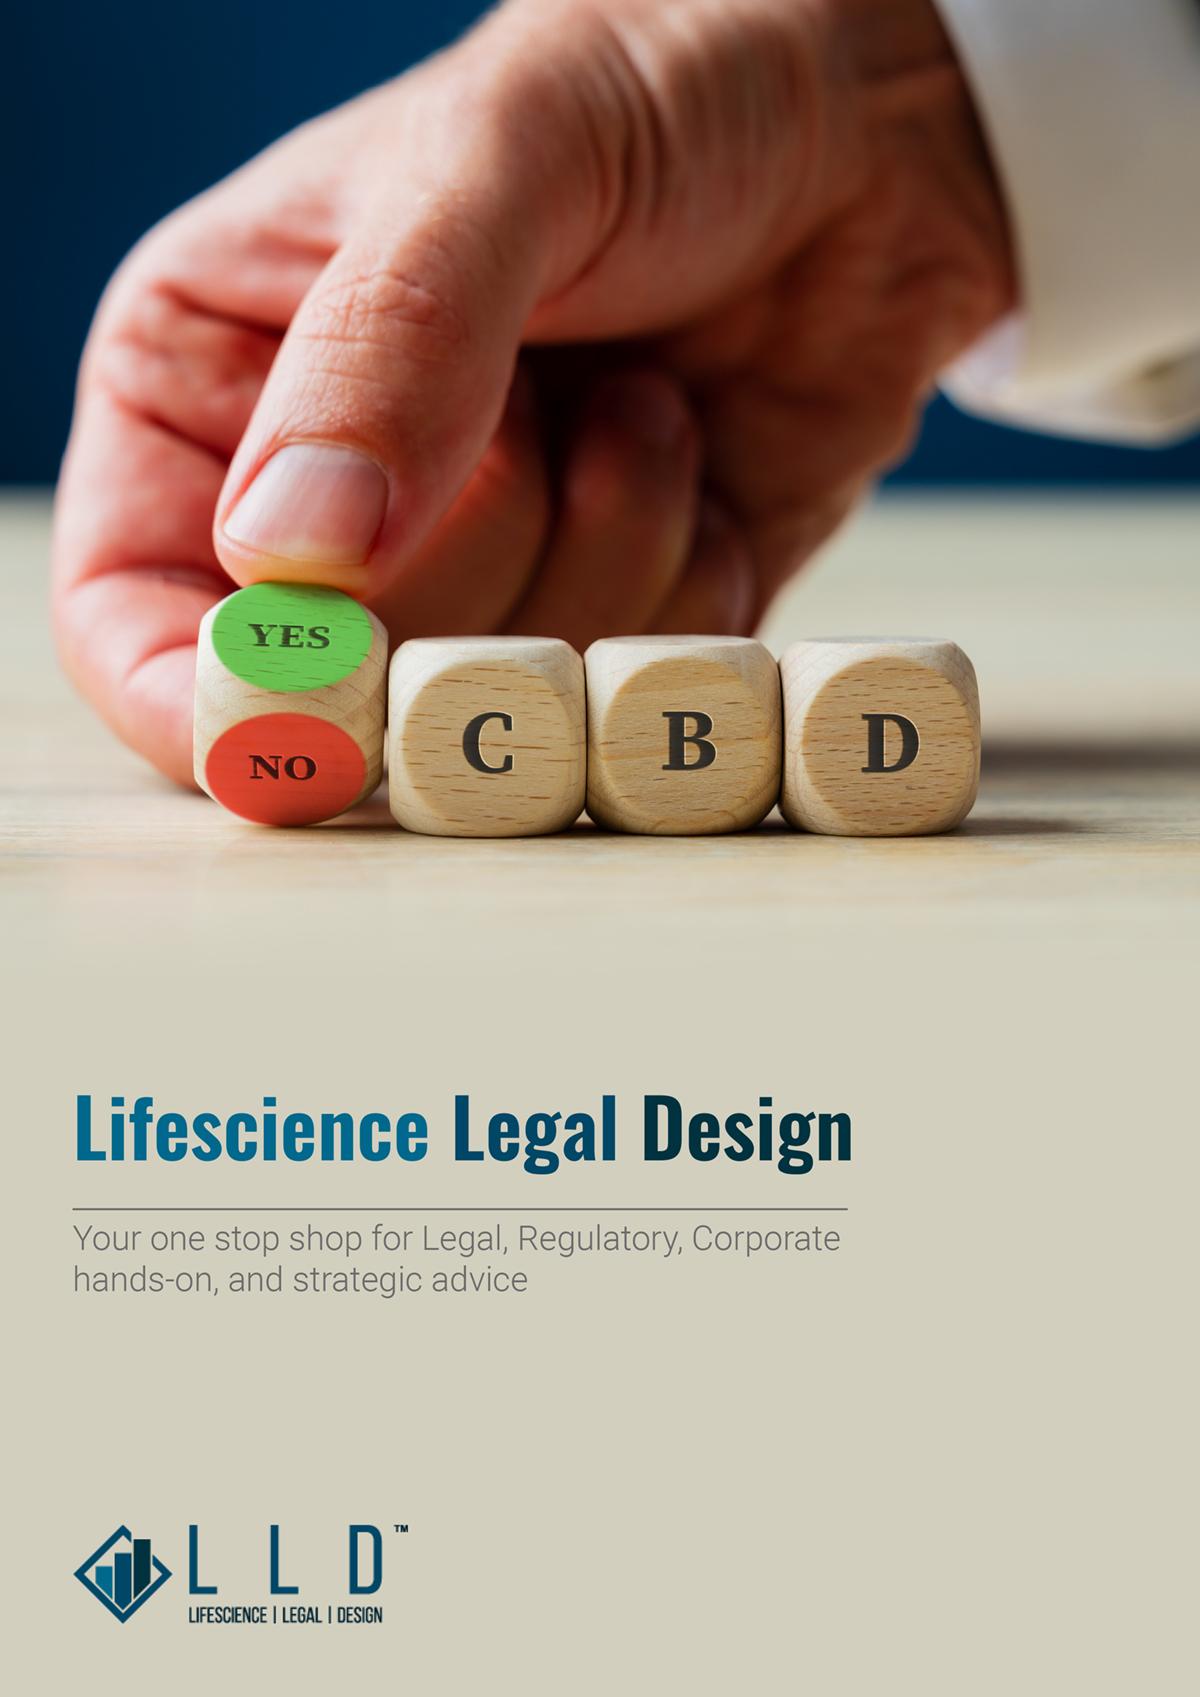 CBD and hemp, Lifescience Legal Design